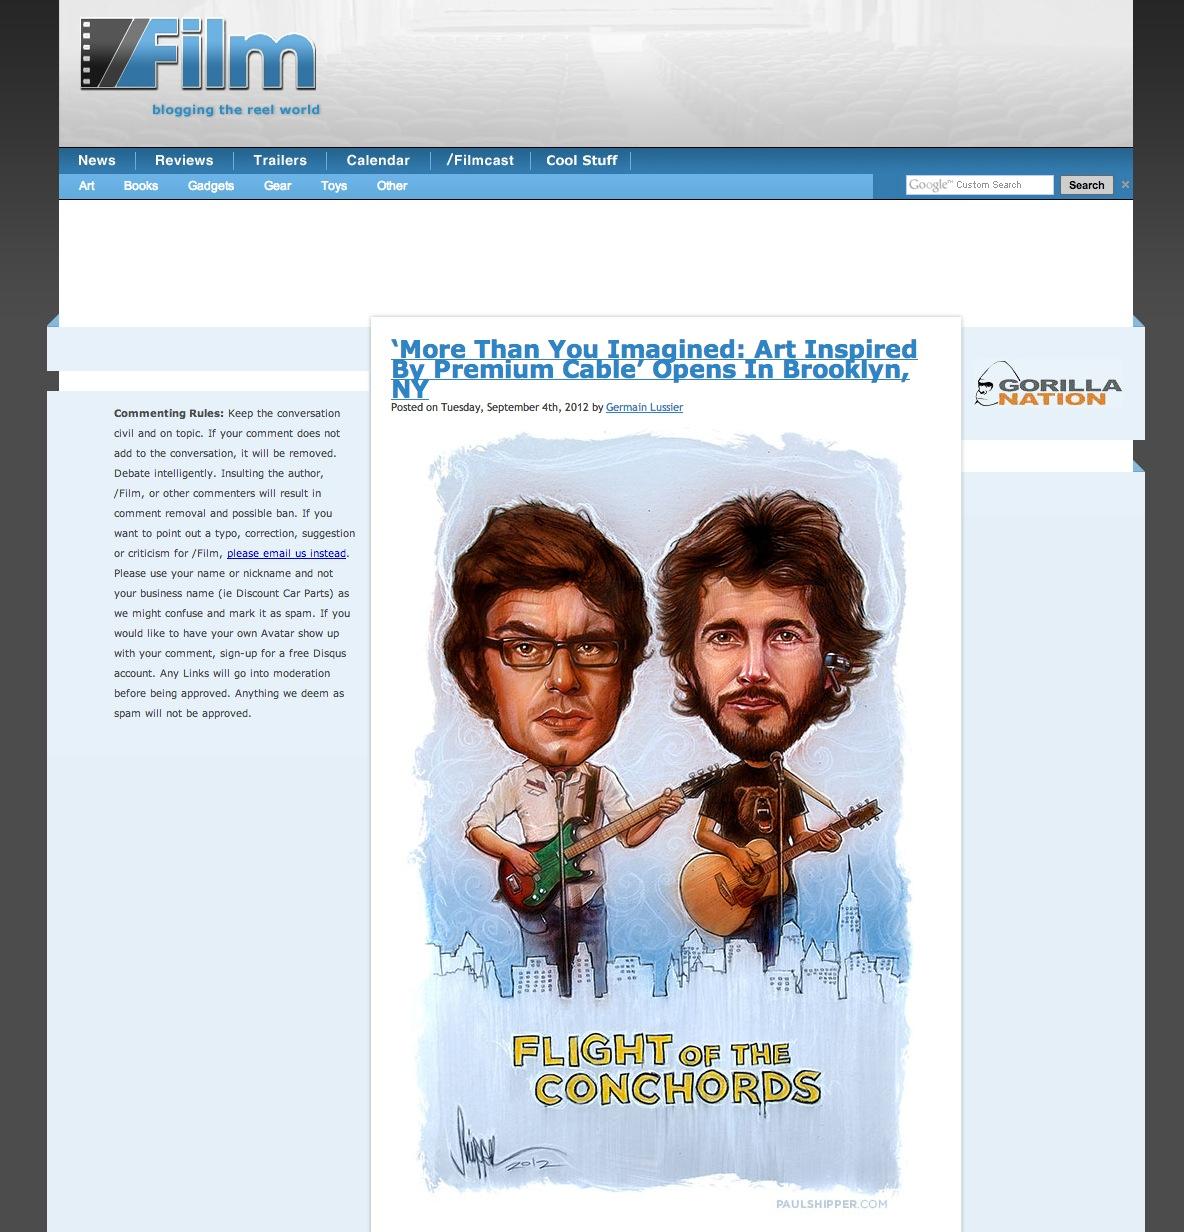 Choncords on Slash Film